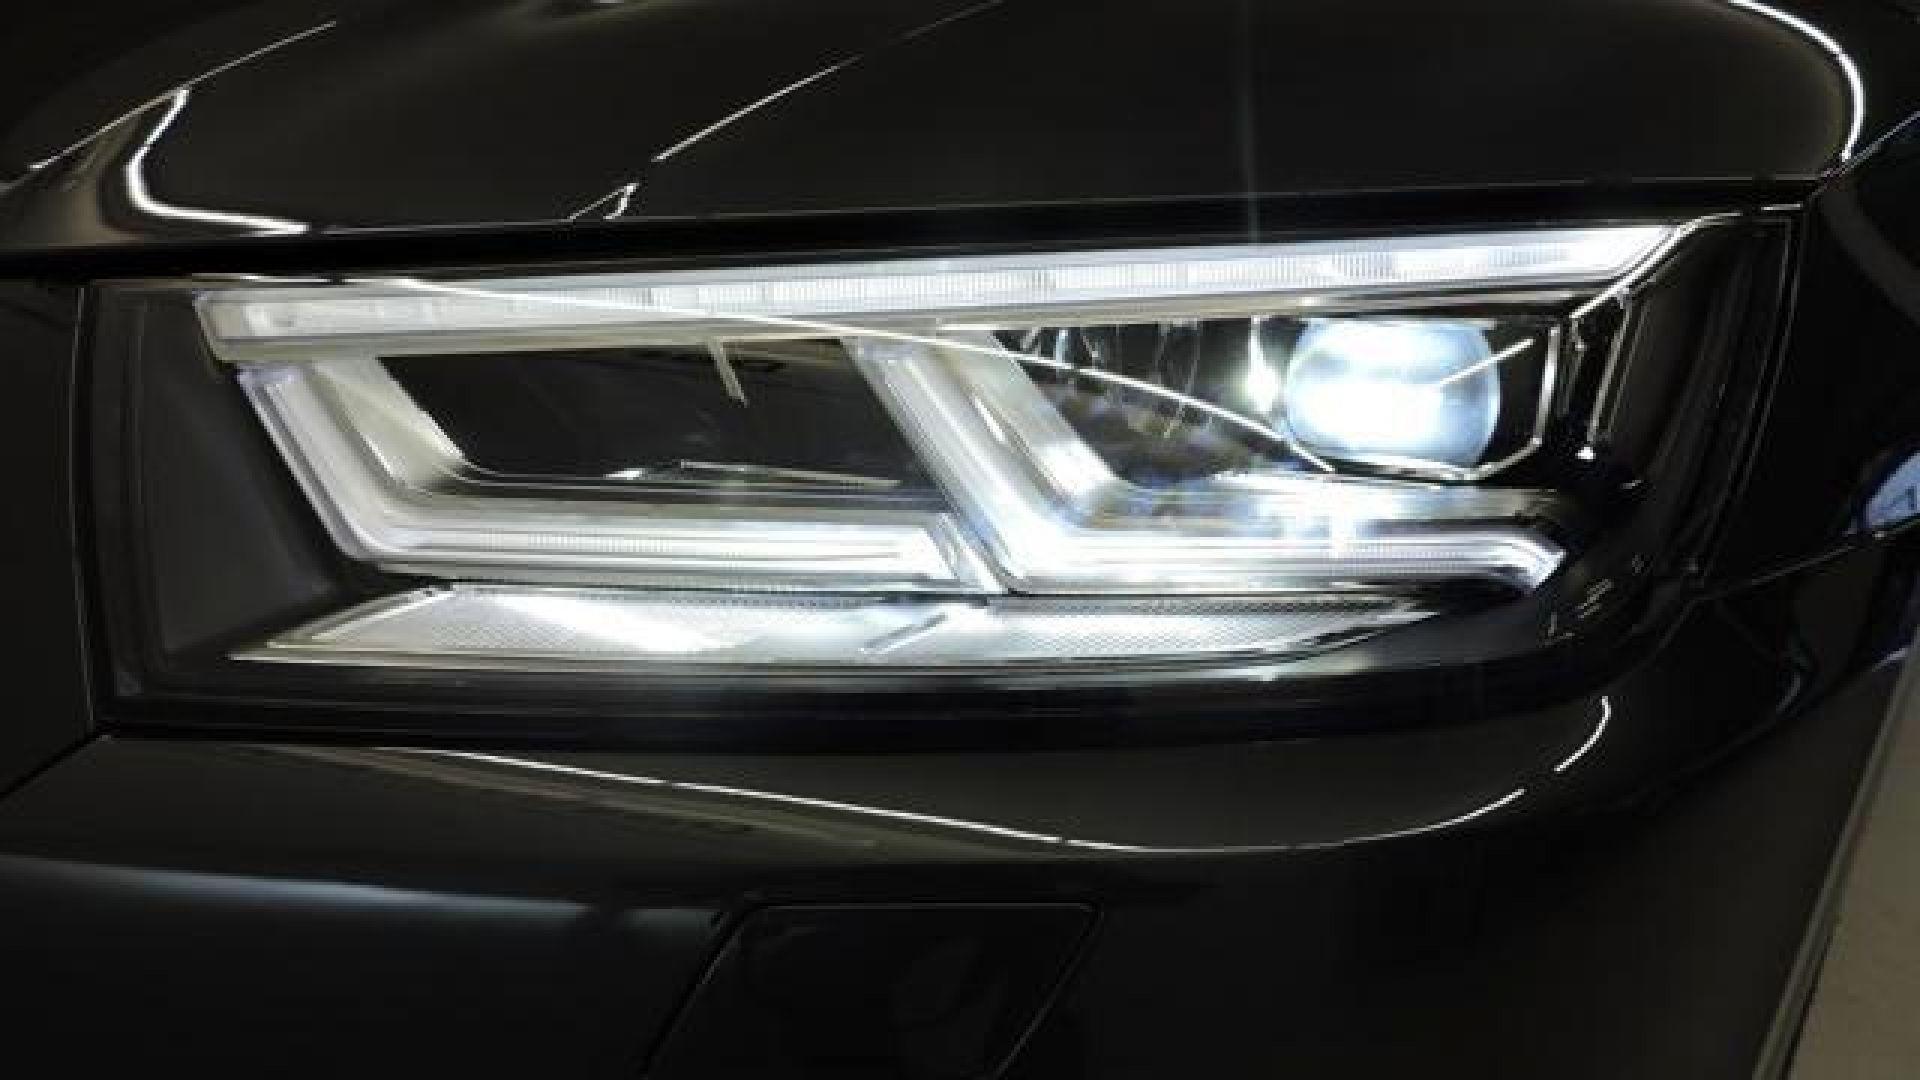 Audi Q5 S line 40 TDI quattro 140 kW (190 CV) S tronic